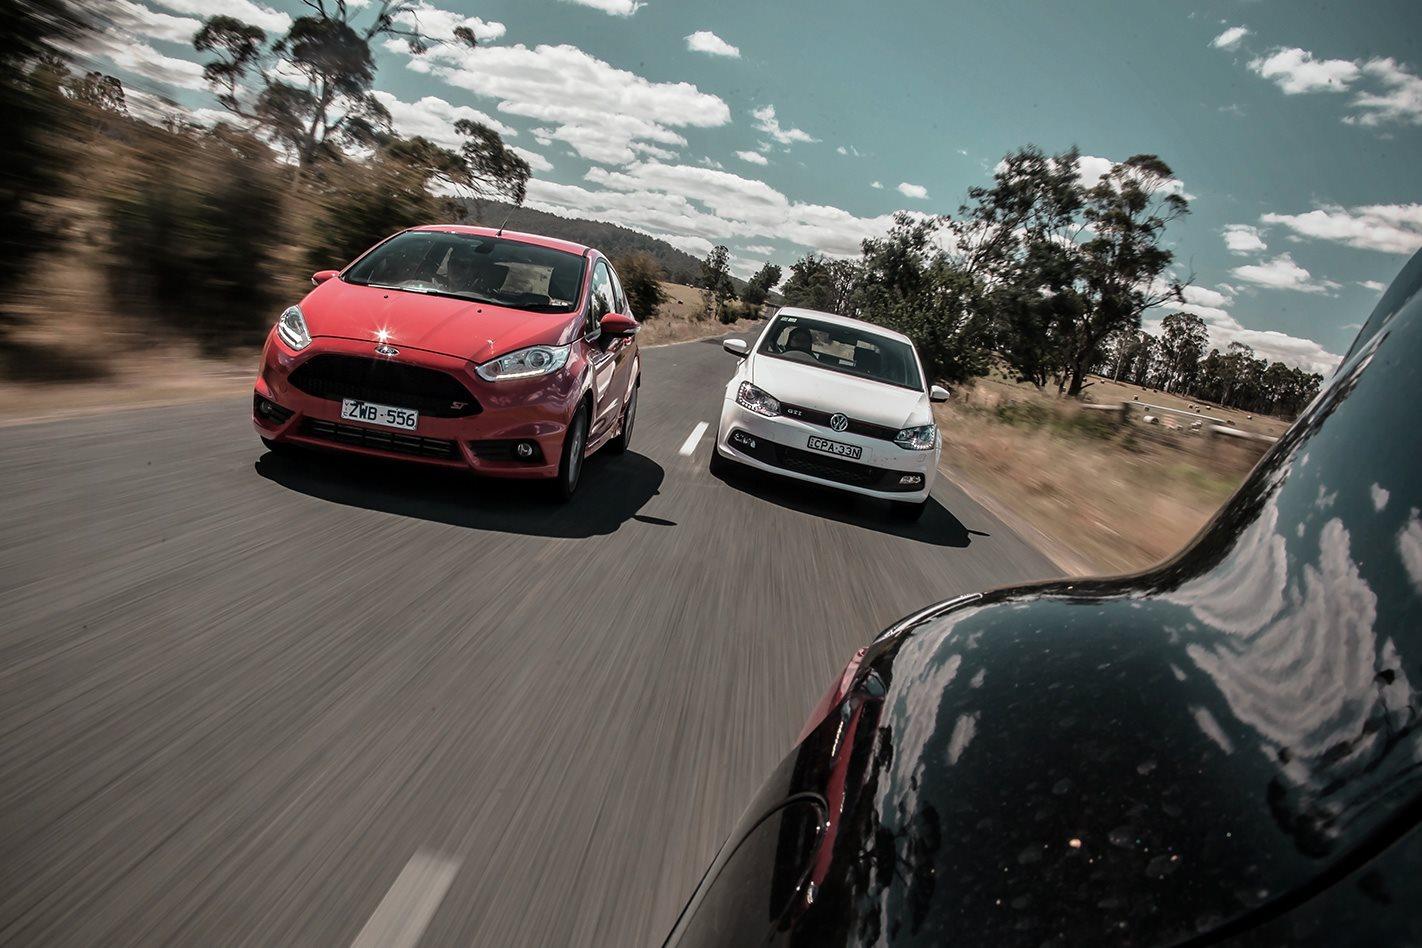 Ford Fiesta ST vs VW Polo GTI